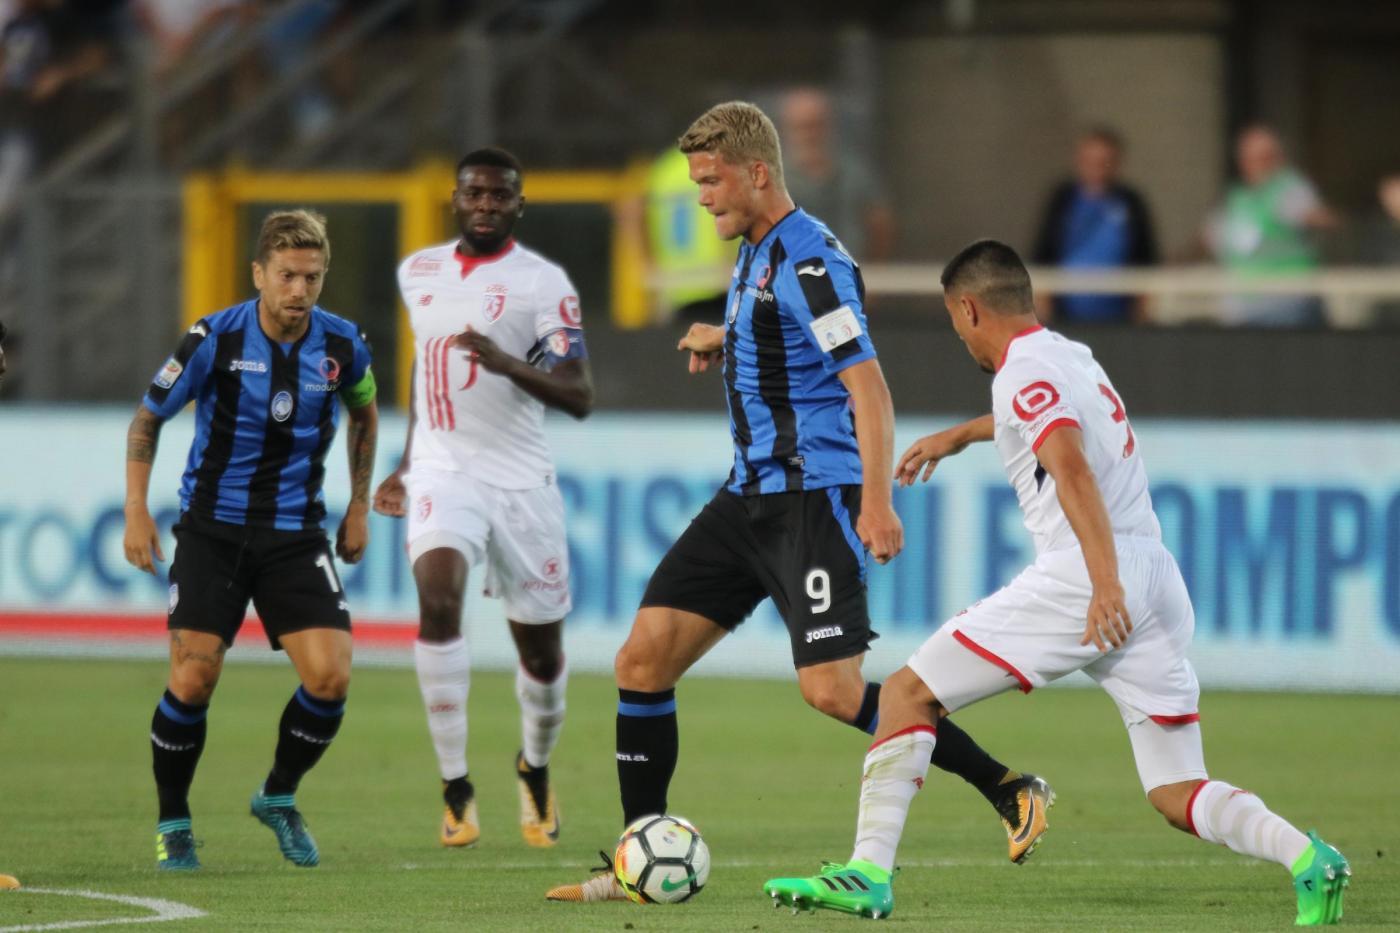 Apollon-Atalanta 2 novembre, analisi e pronostico Europa League giornata 4